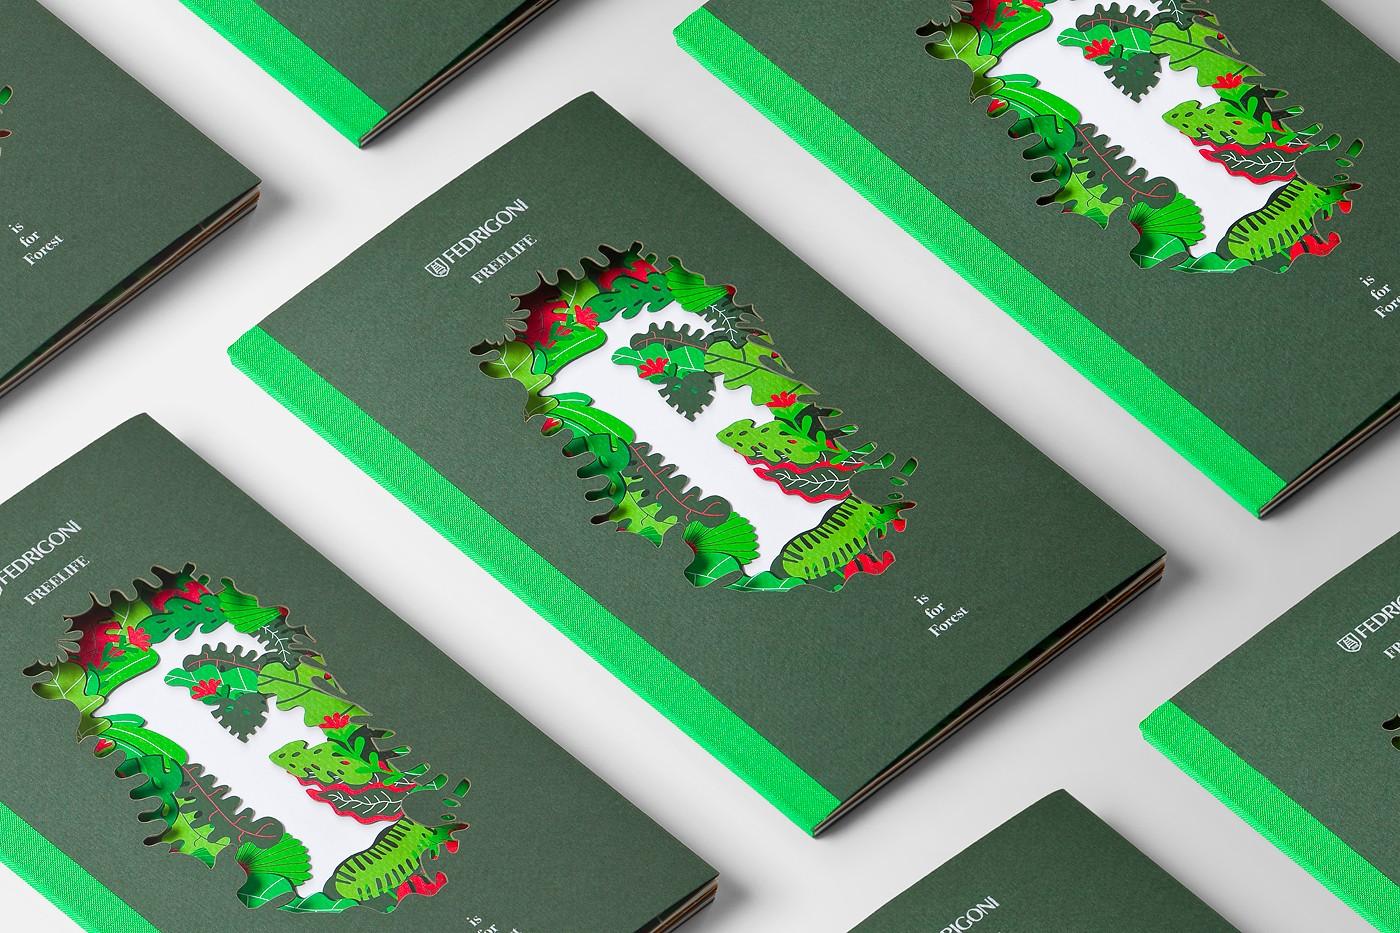 Fedrigoni環保主題平面視覺設計